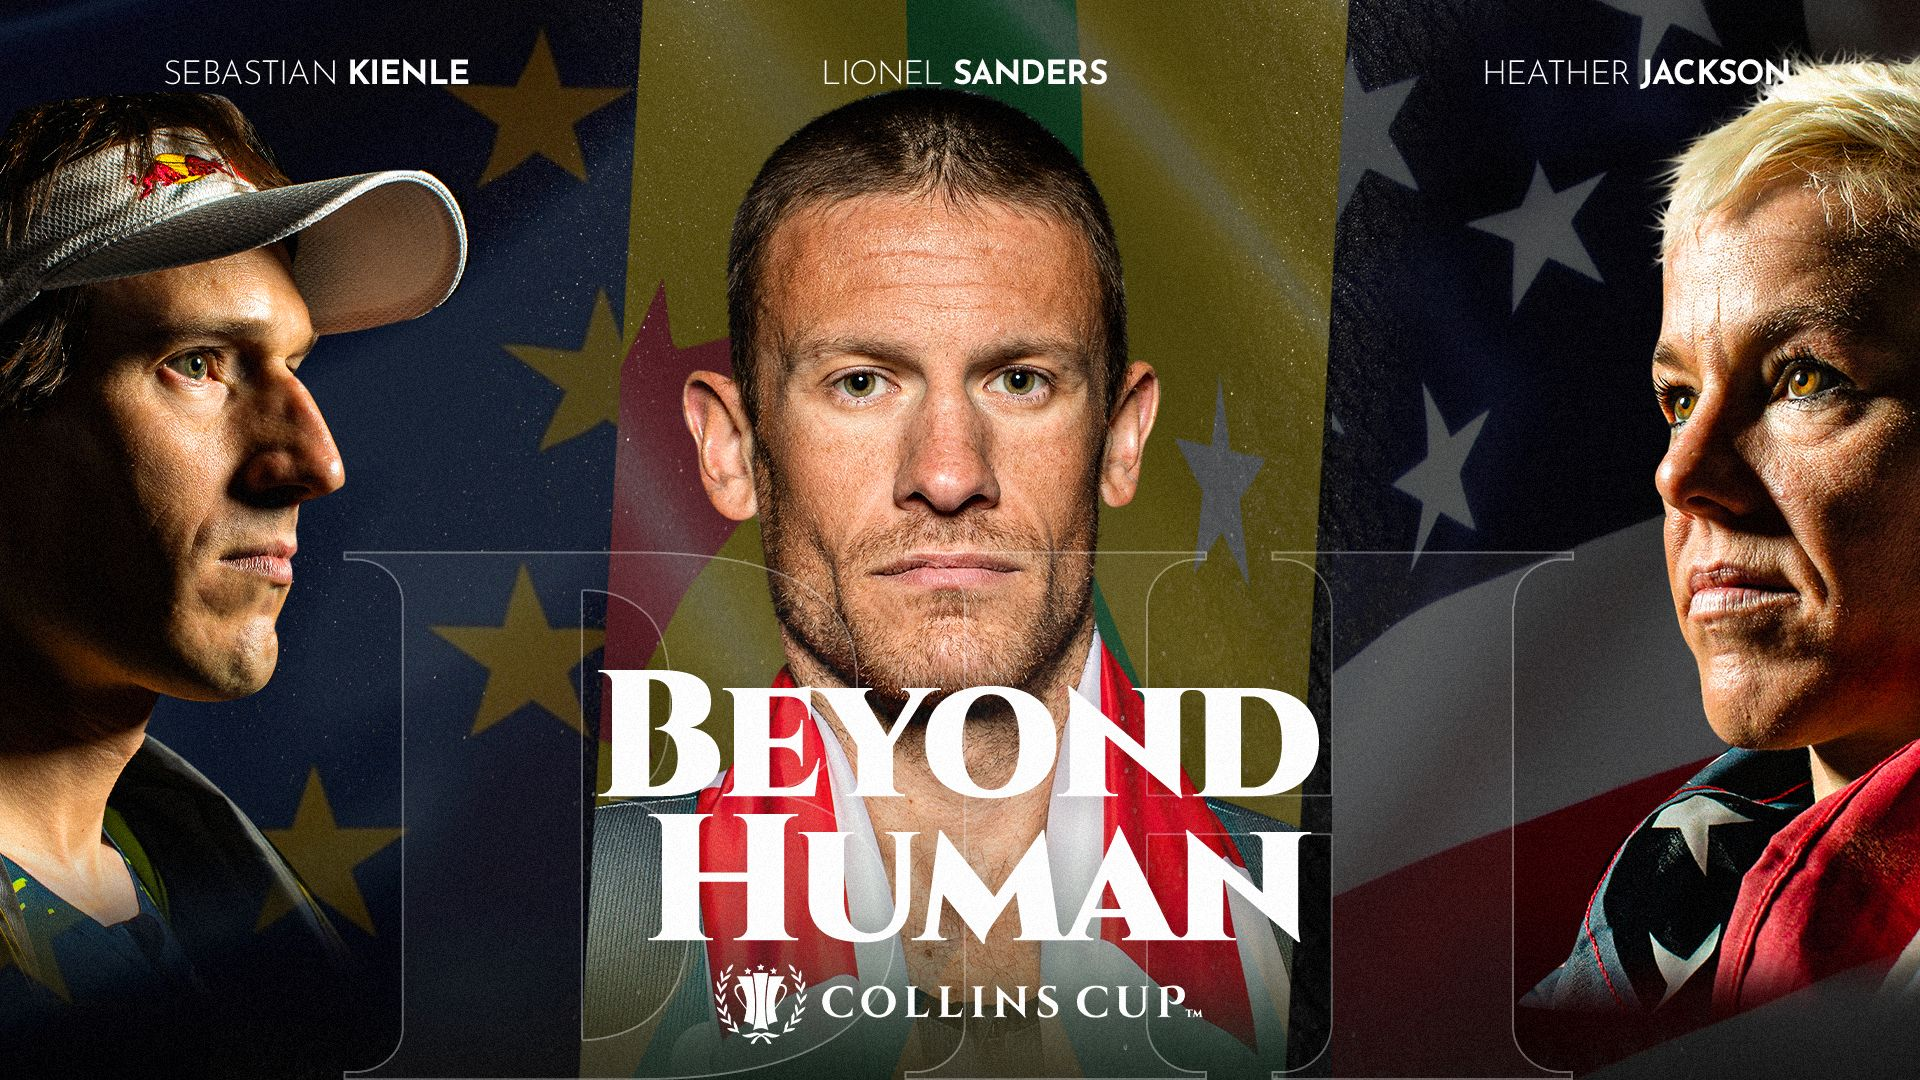 Beyond Human Trailer | Collins Cup